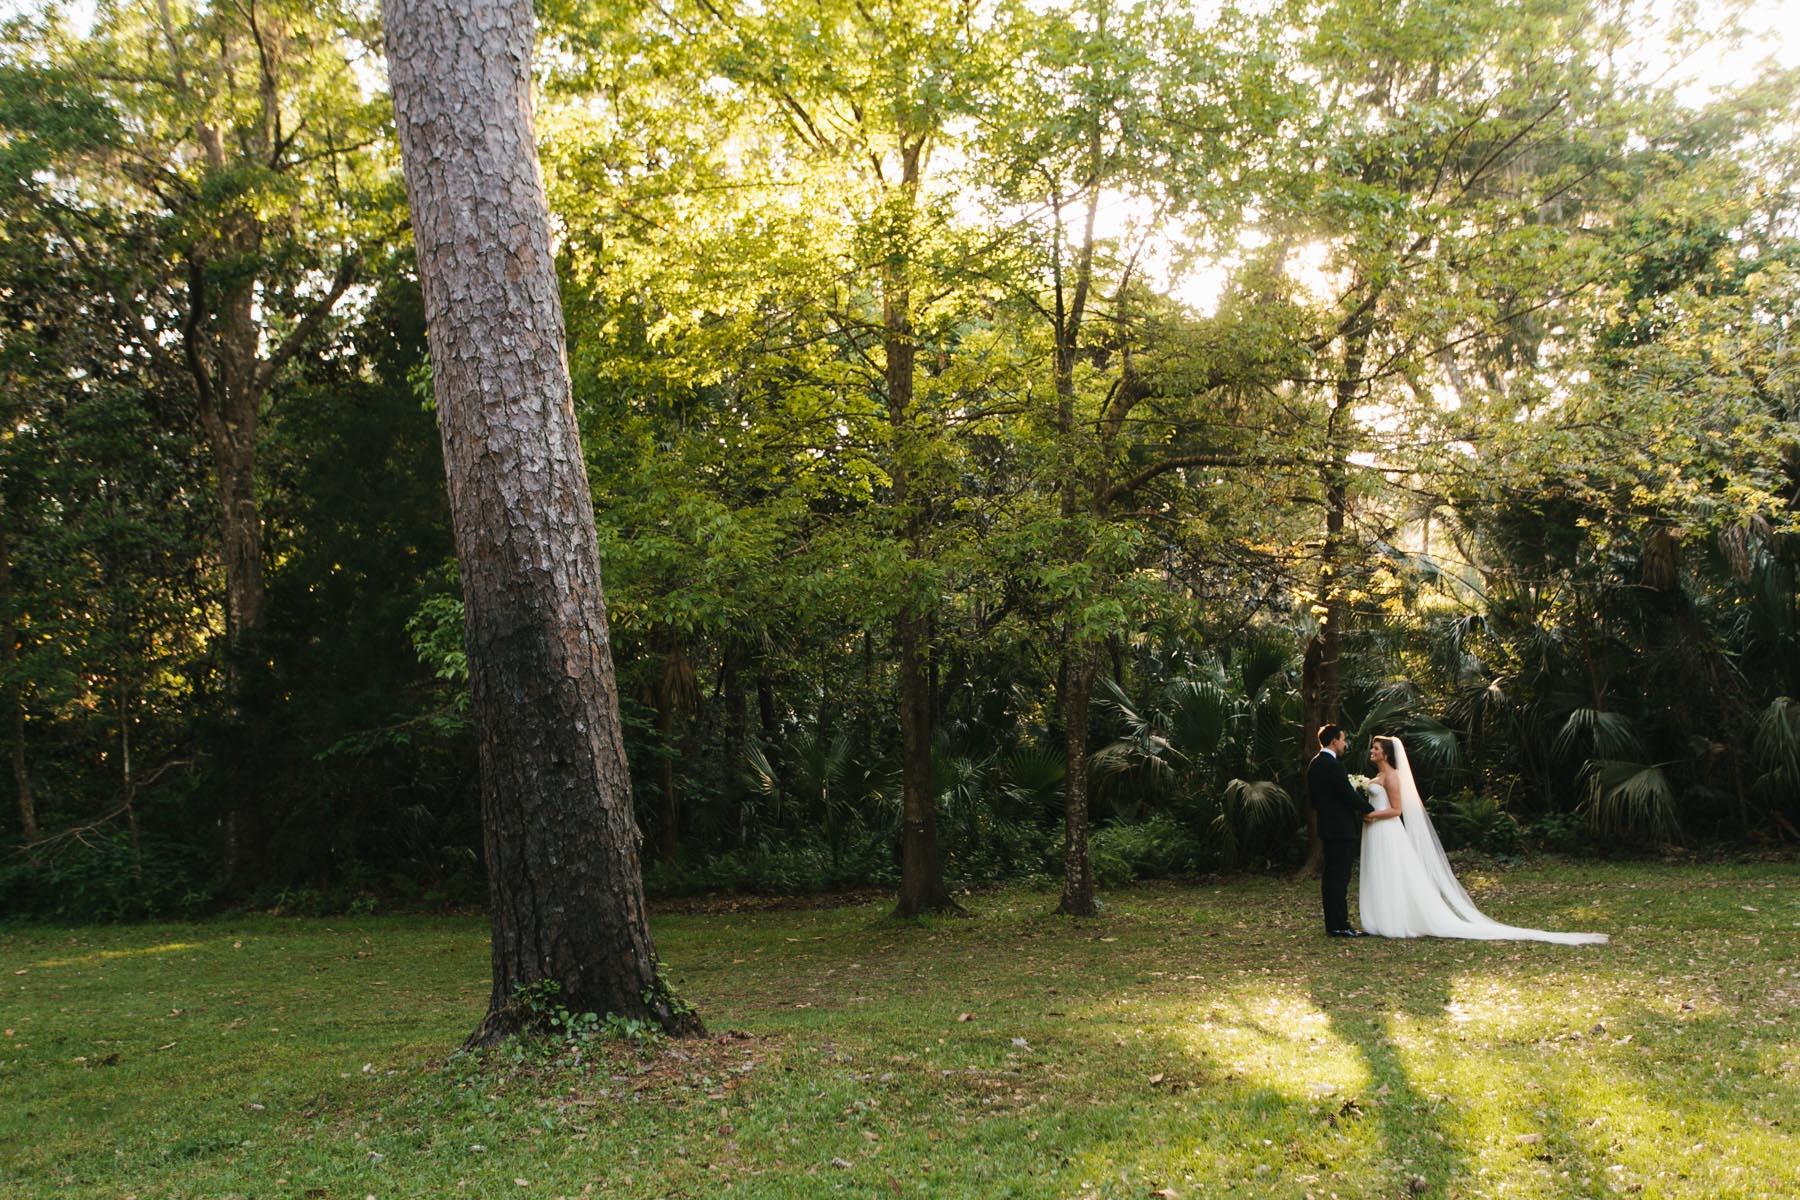 lowry wedding blog eden garden florida wedding-83